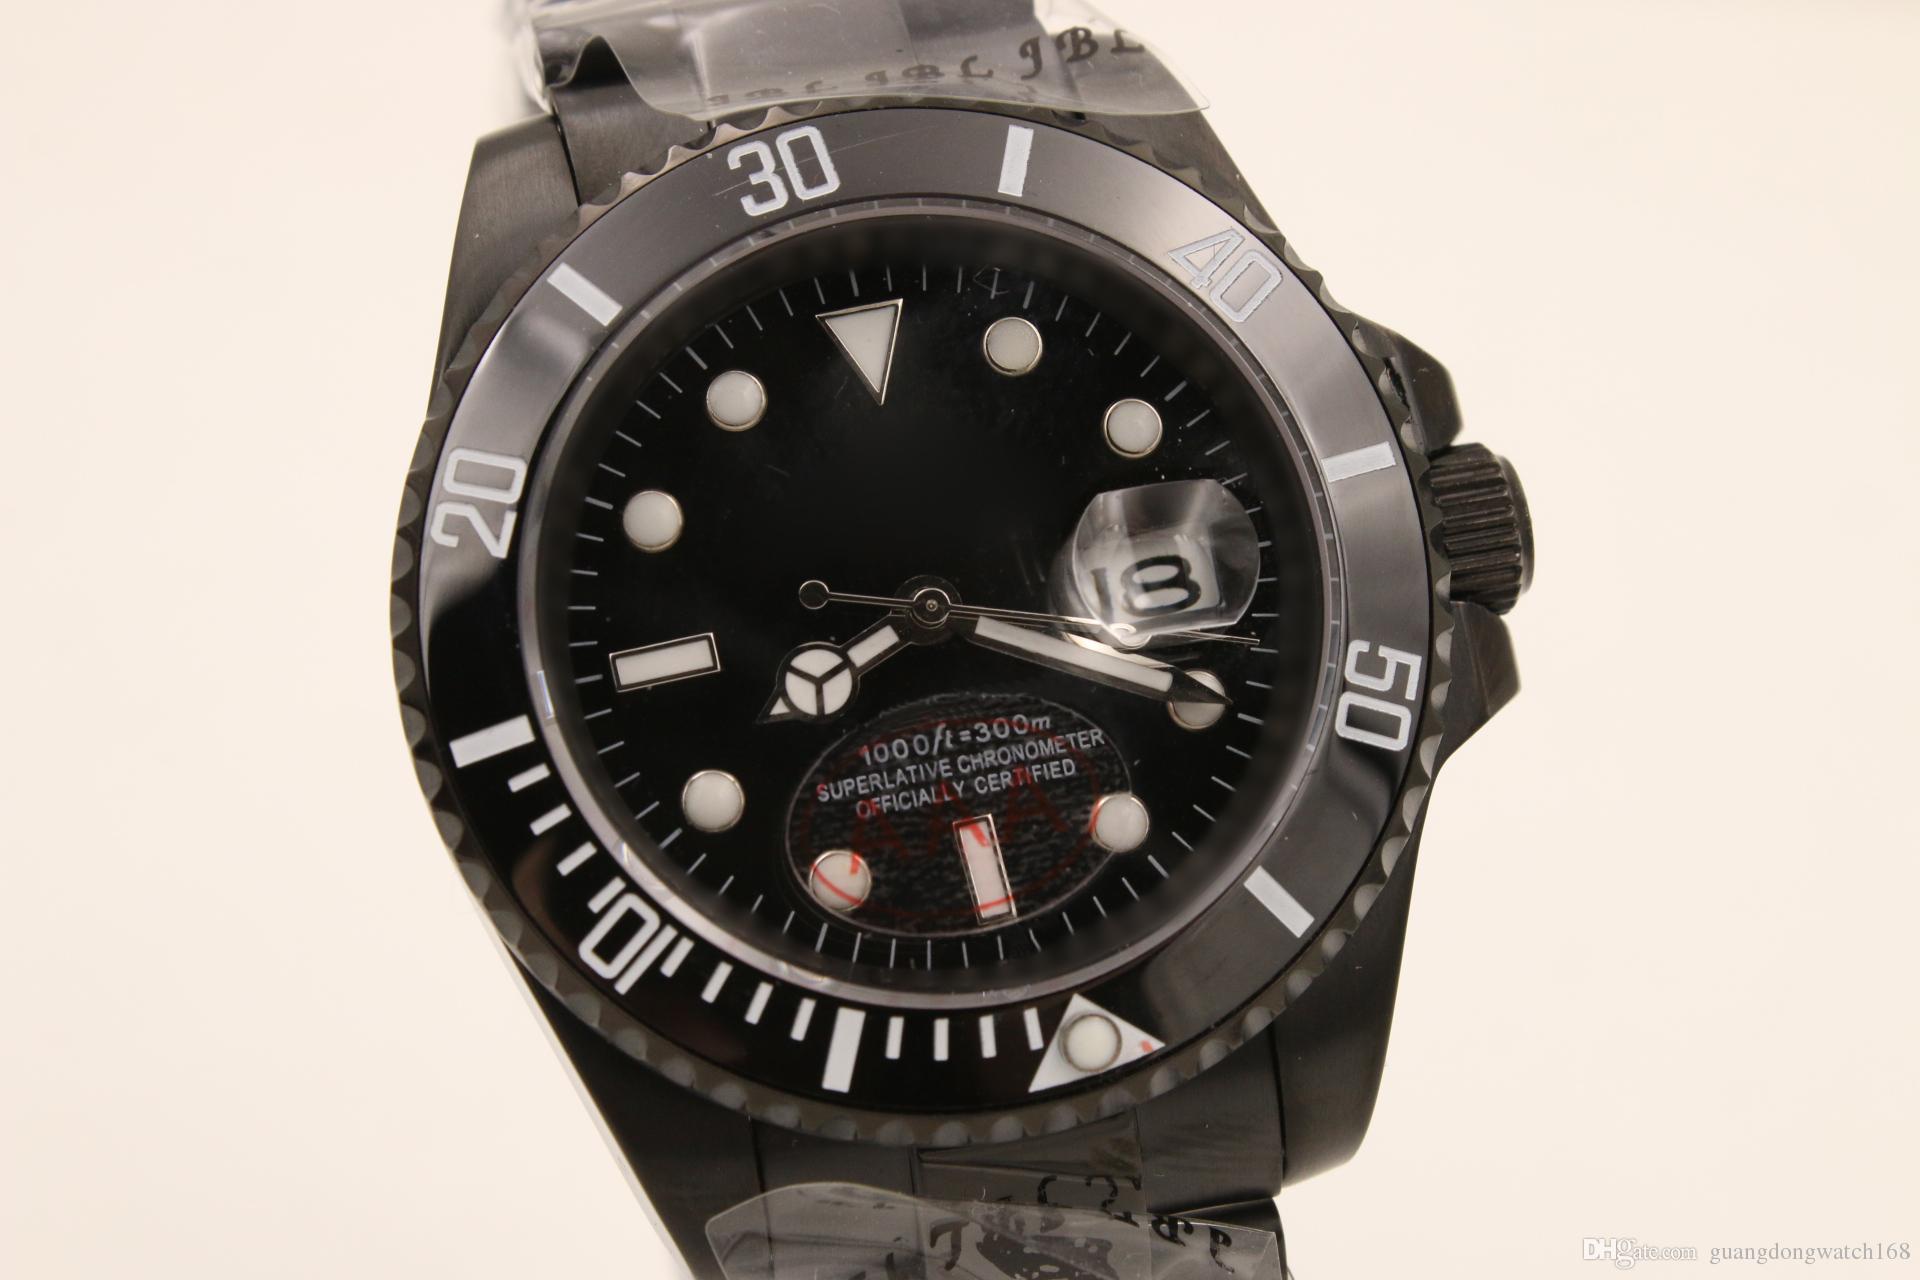 d03ab581f6b Luxury Brand Watch AAA Men Automatic Rolix 40MM SUB- Mariner Black Face  Mechanics Mens Wristwatches Original 18K Gold Stainless Steel Clasp Fashion  Sports ...